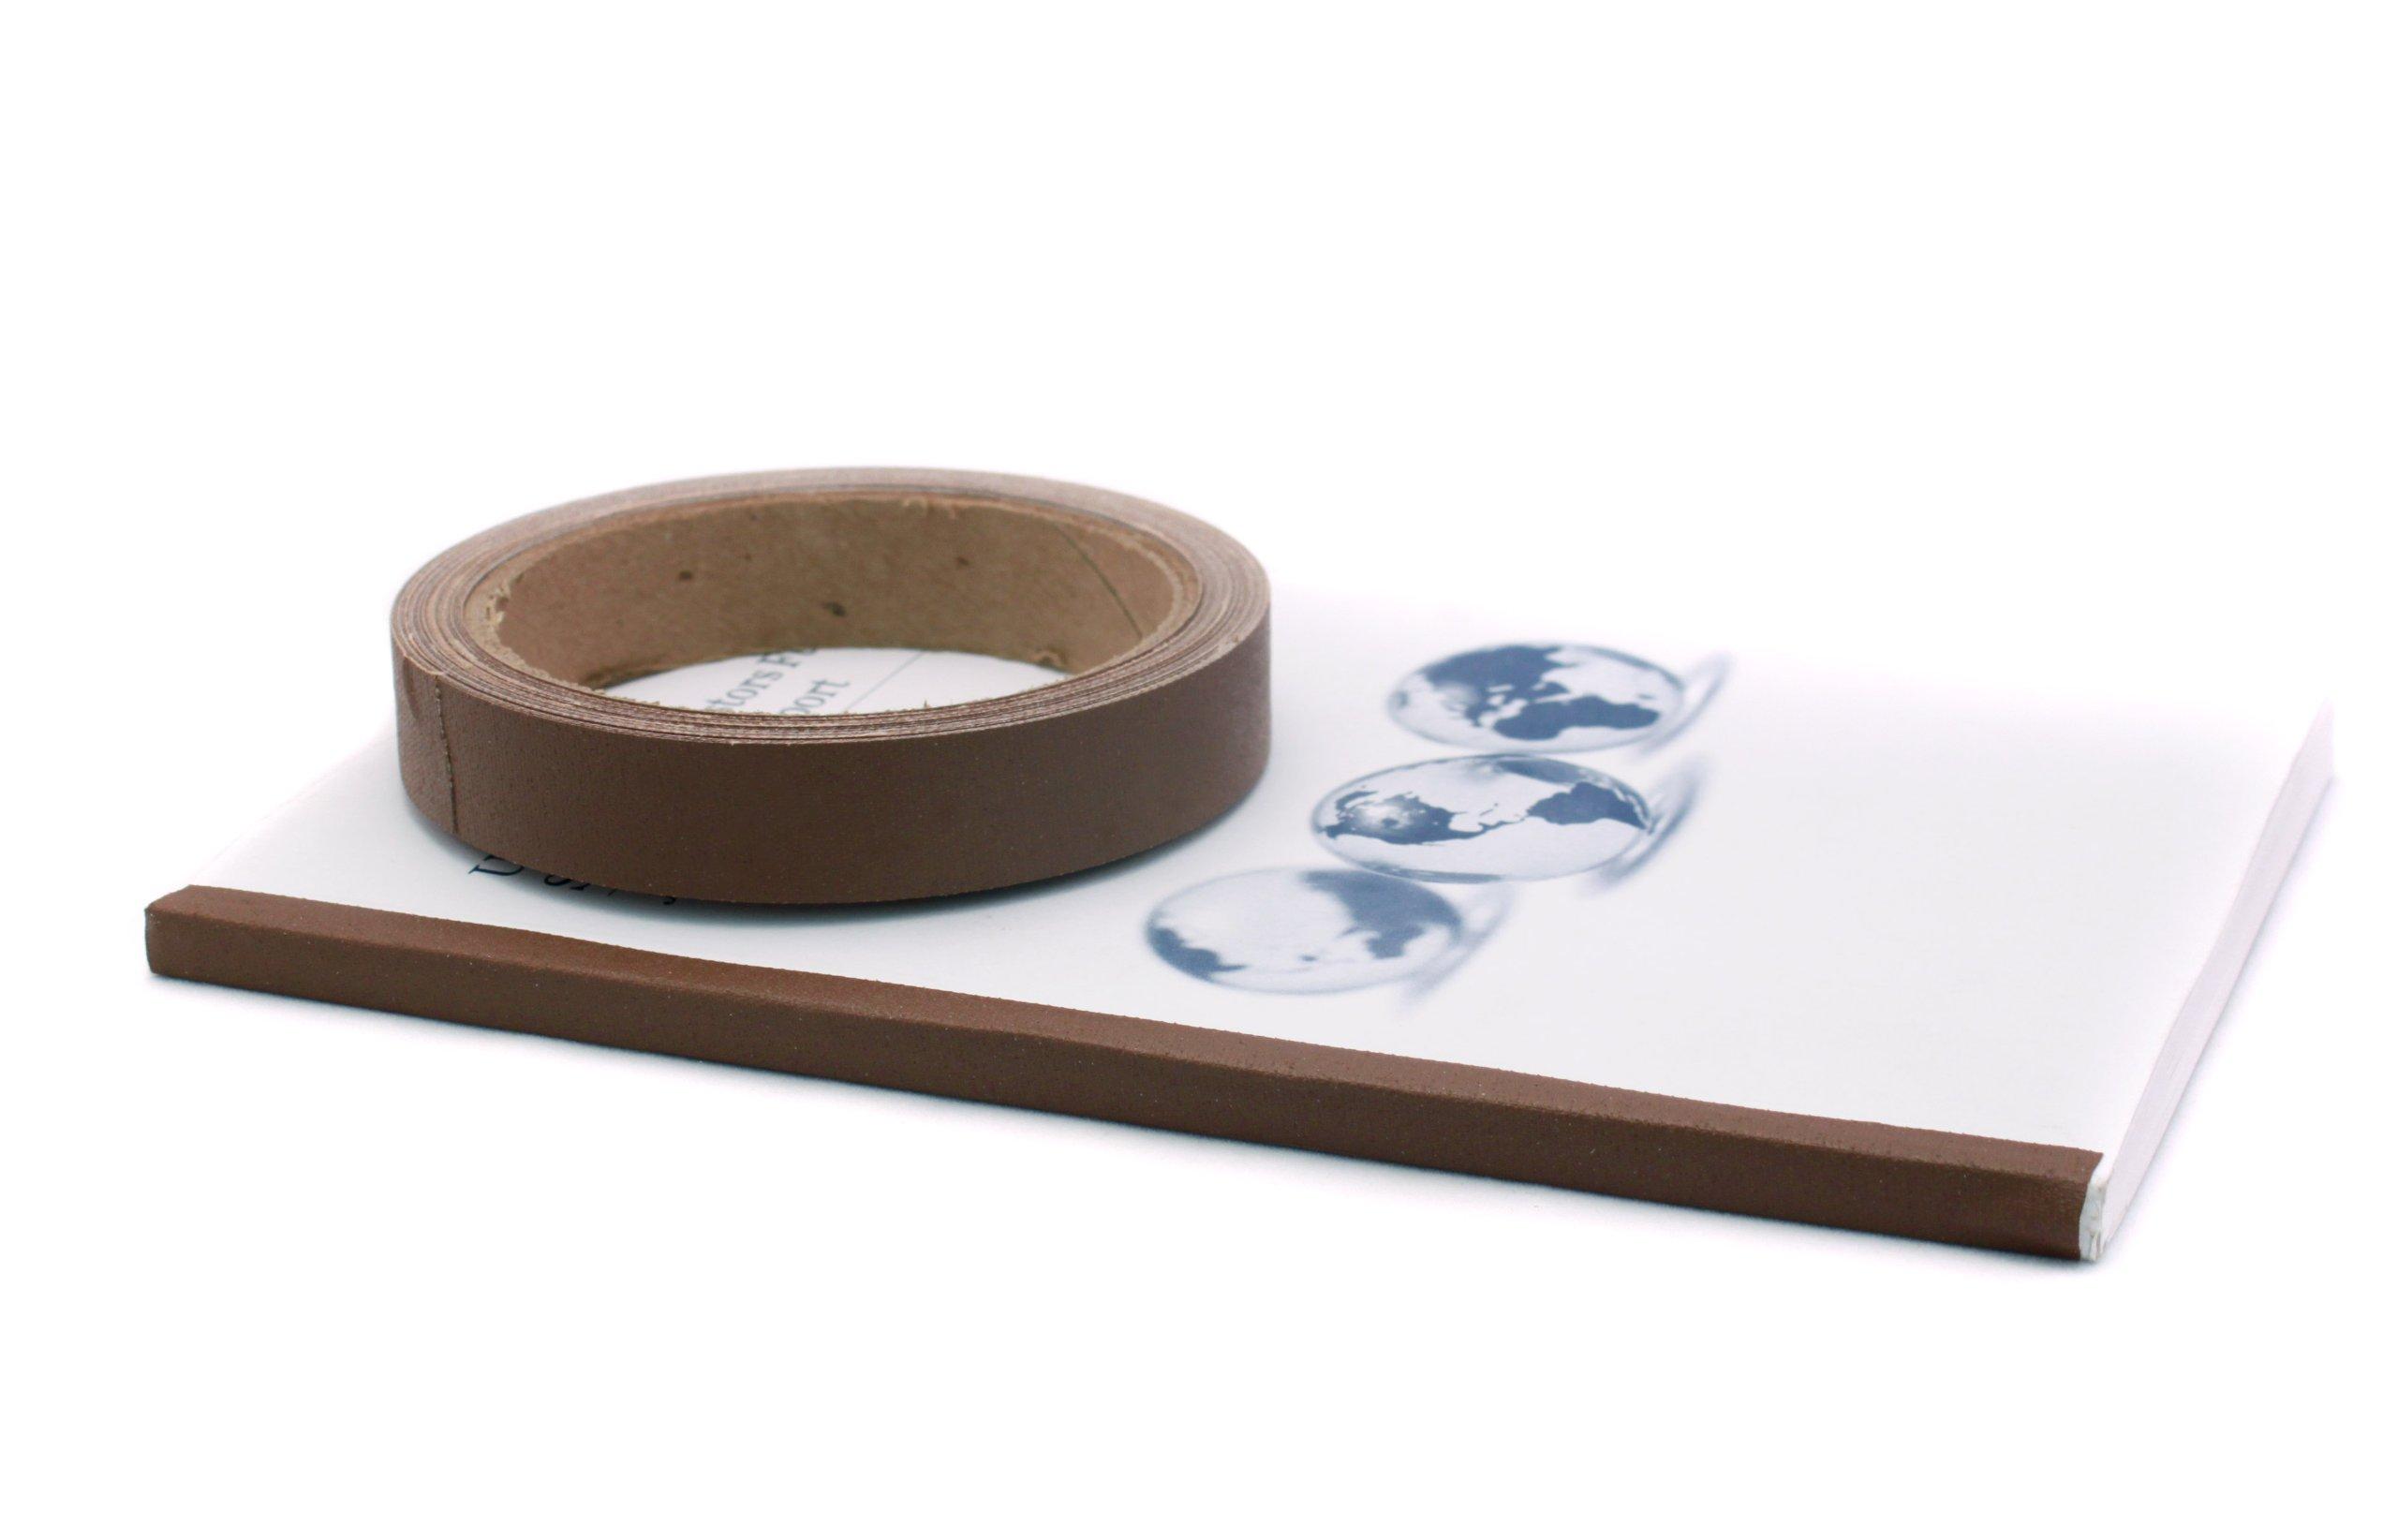 3/4'' Black Colored Premium-Cloth Book Binding Repair Tape | 15 Yard Roll (BookGuard Brand)